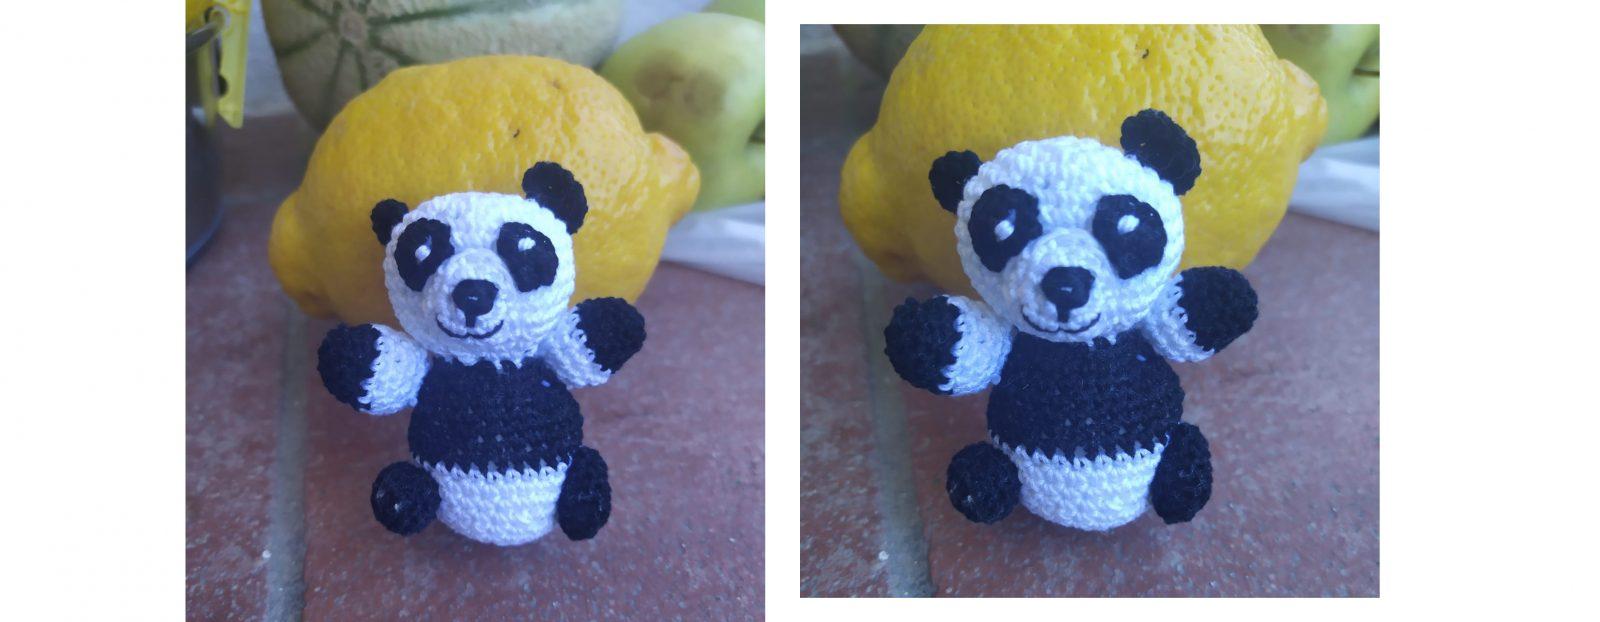 orsetto-panda-amigurumi